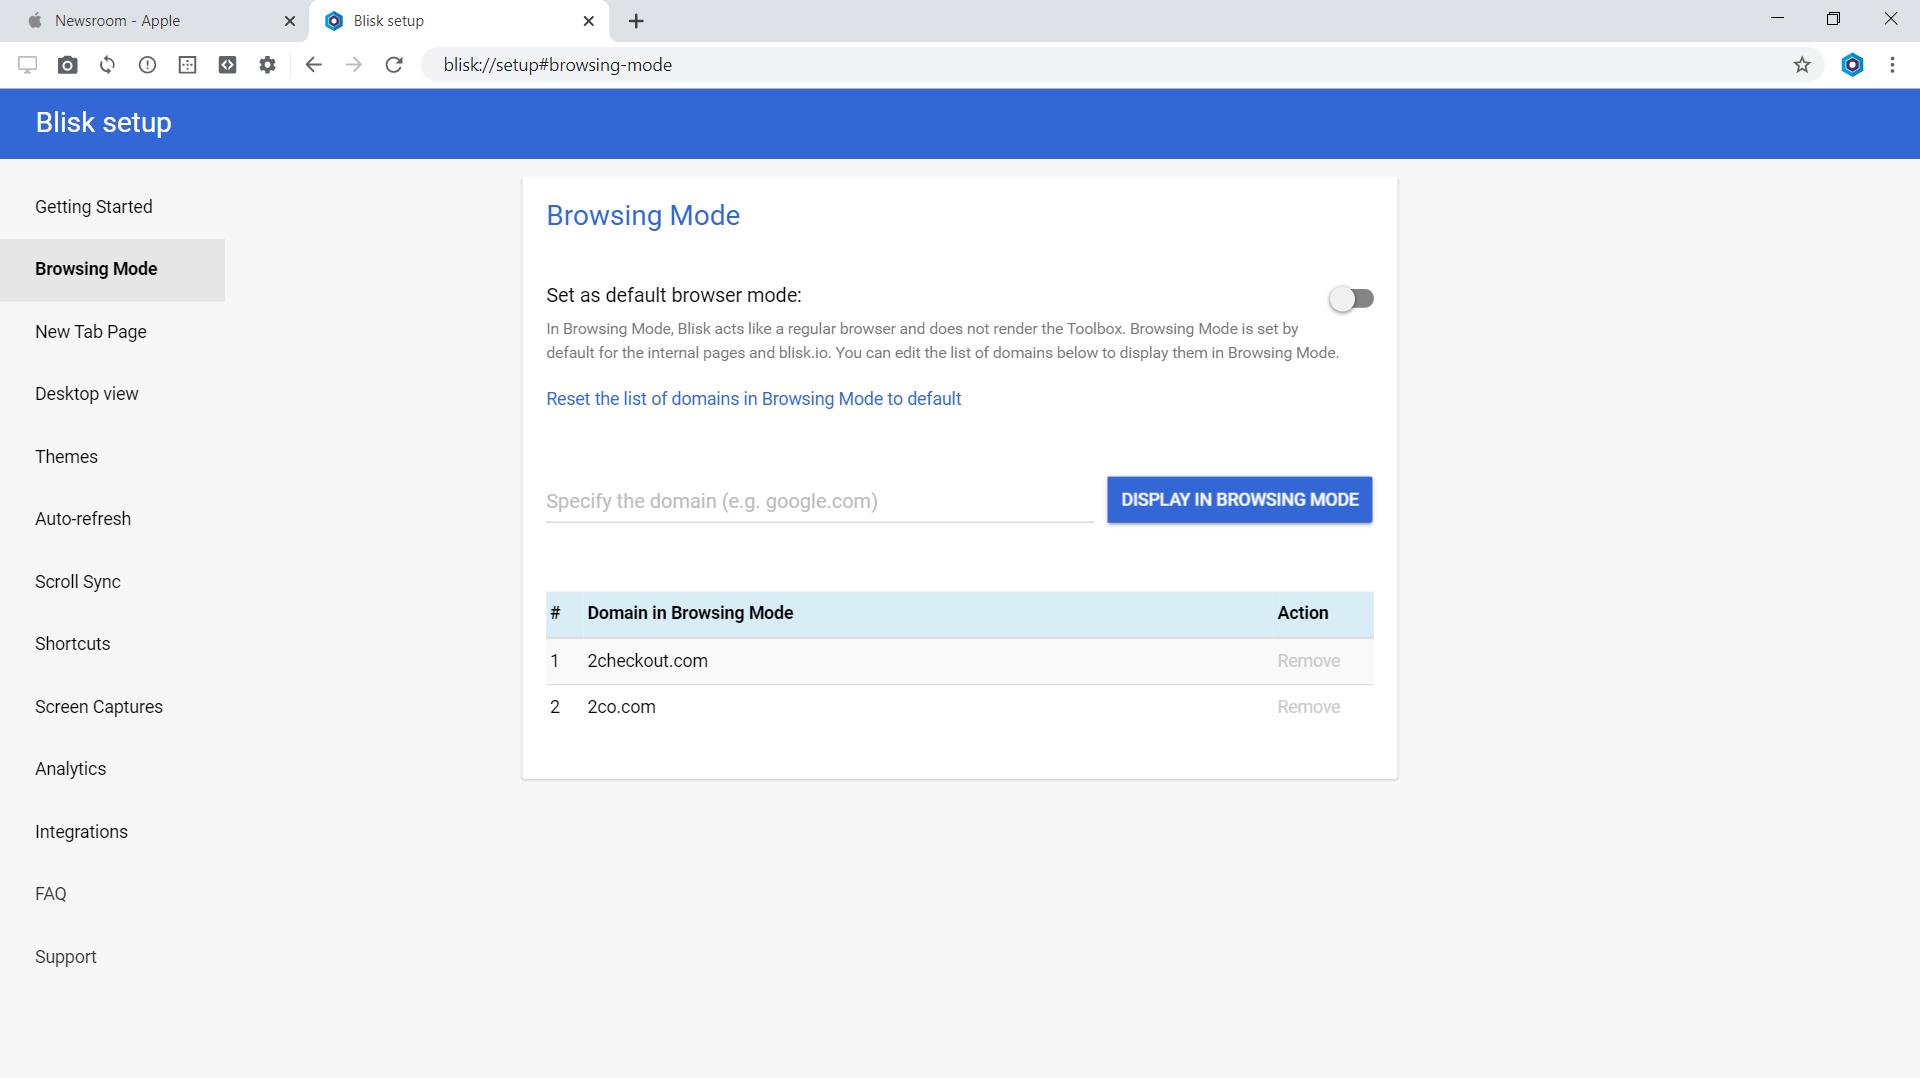 Blisk: Browsing mode